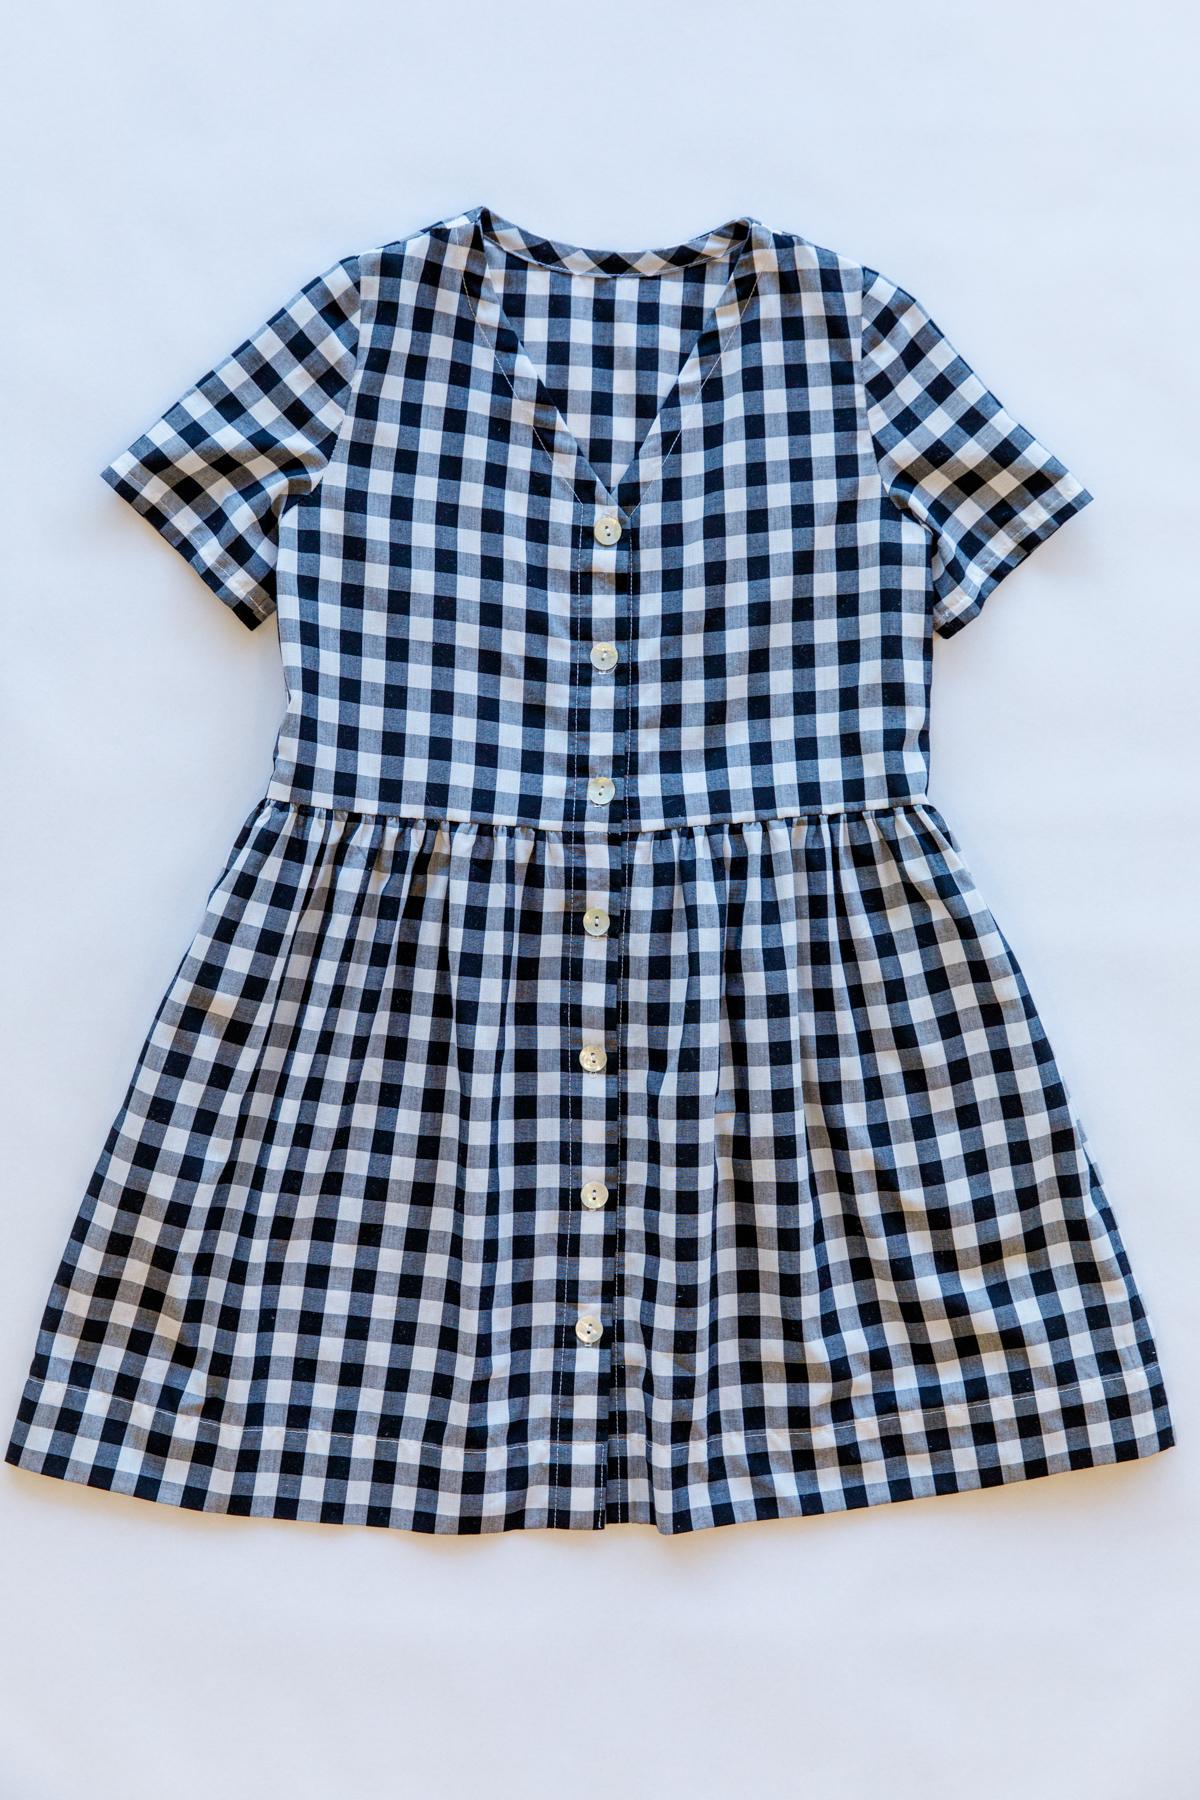 Mini Darling Ranges short sleeve dress